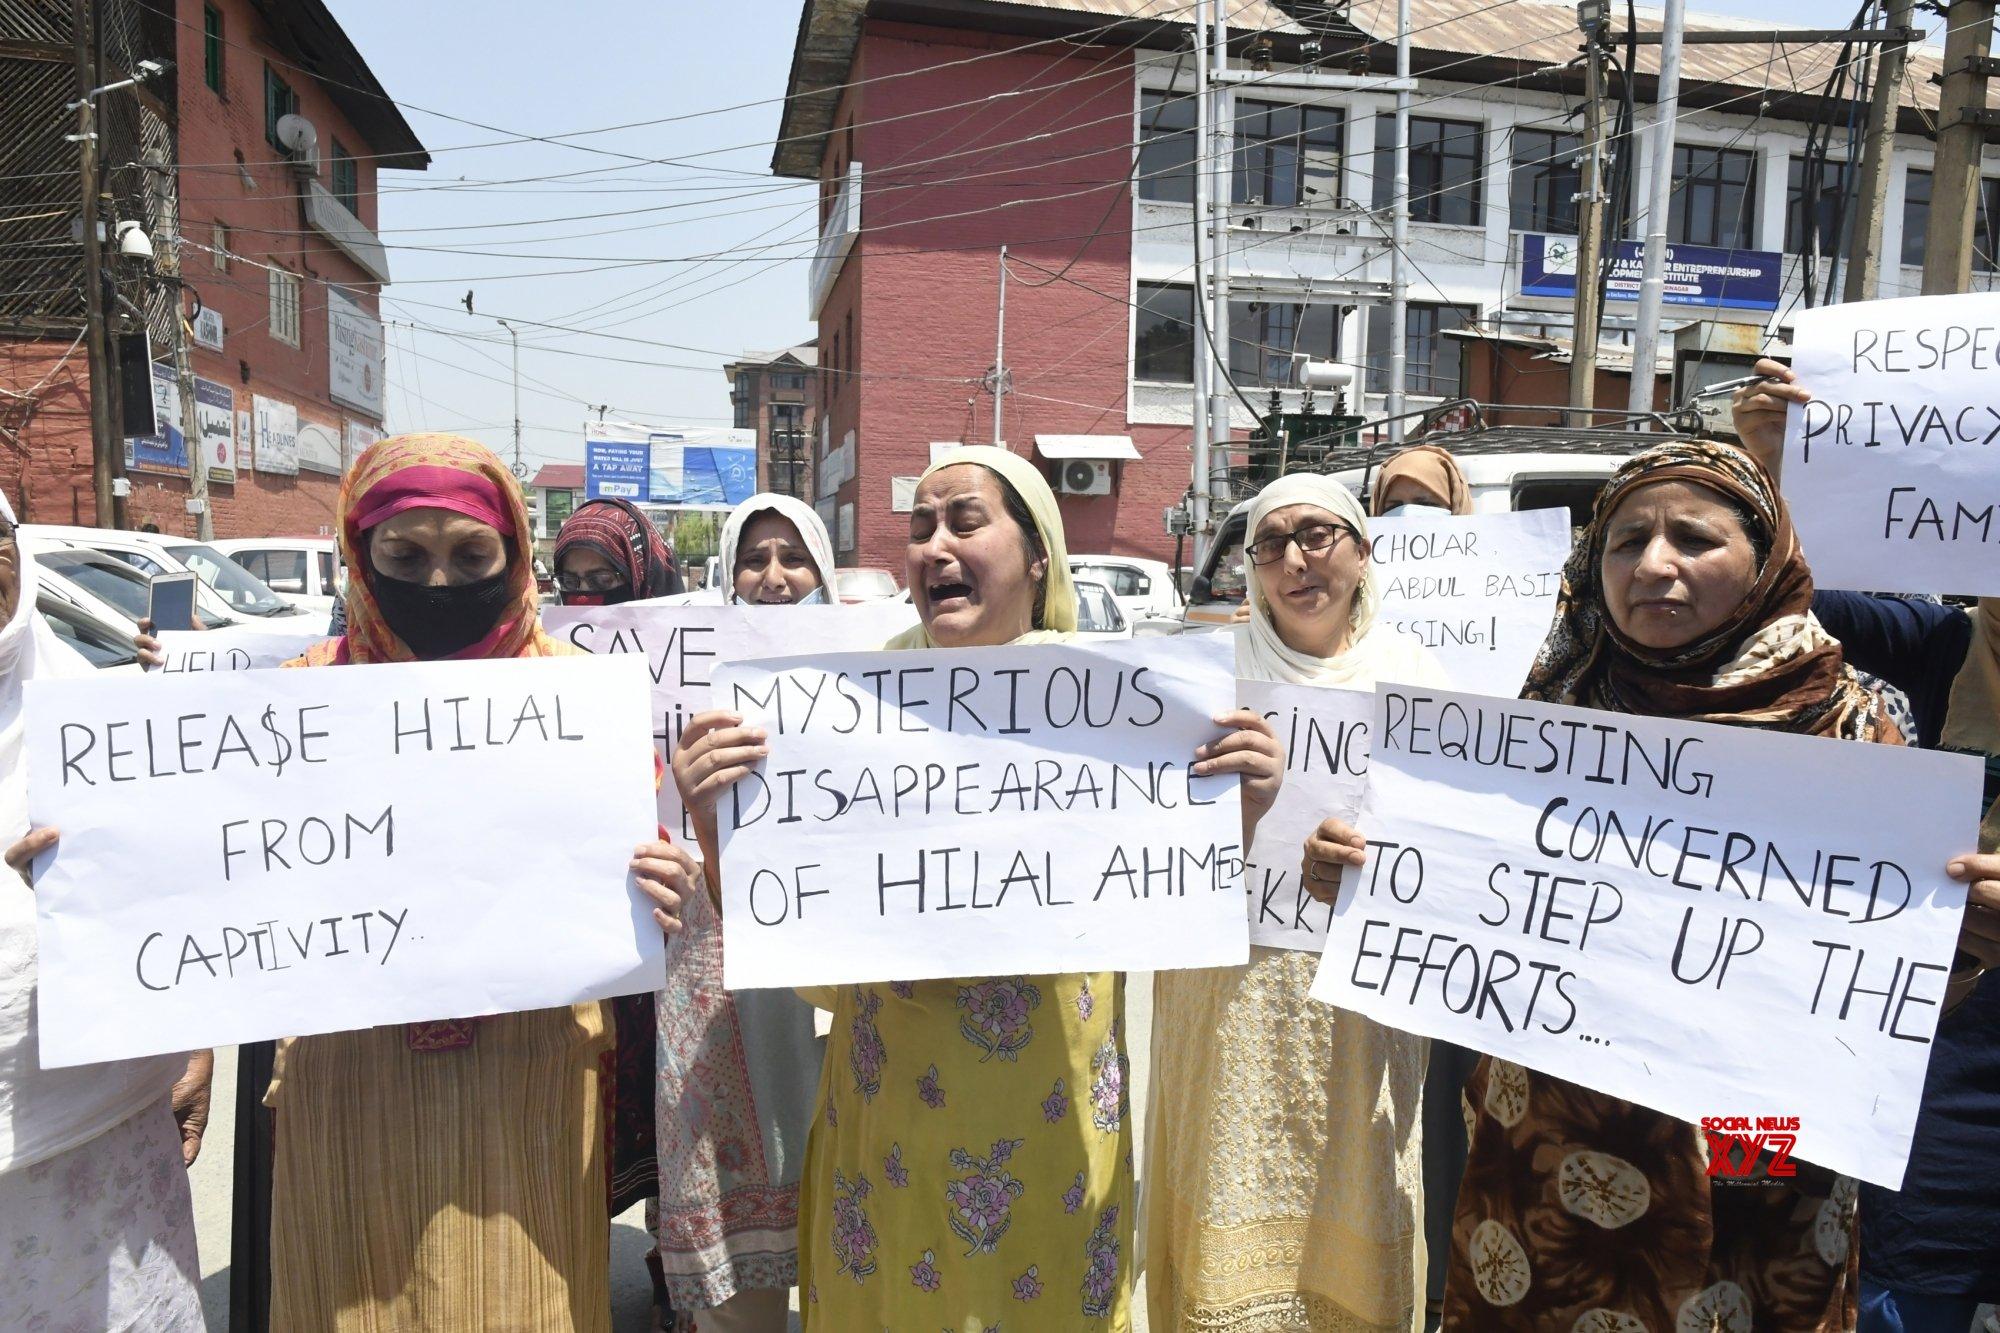 Srinagar: Missing Kashmiri scholar's family seeks help to trace him #Gallery